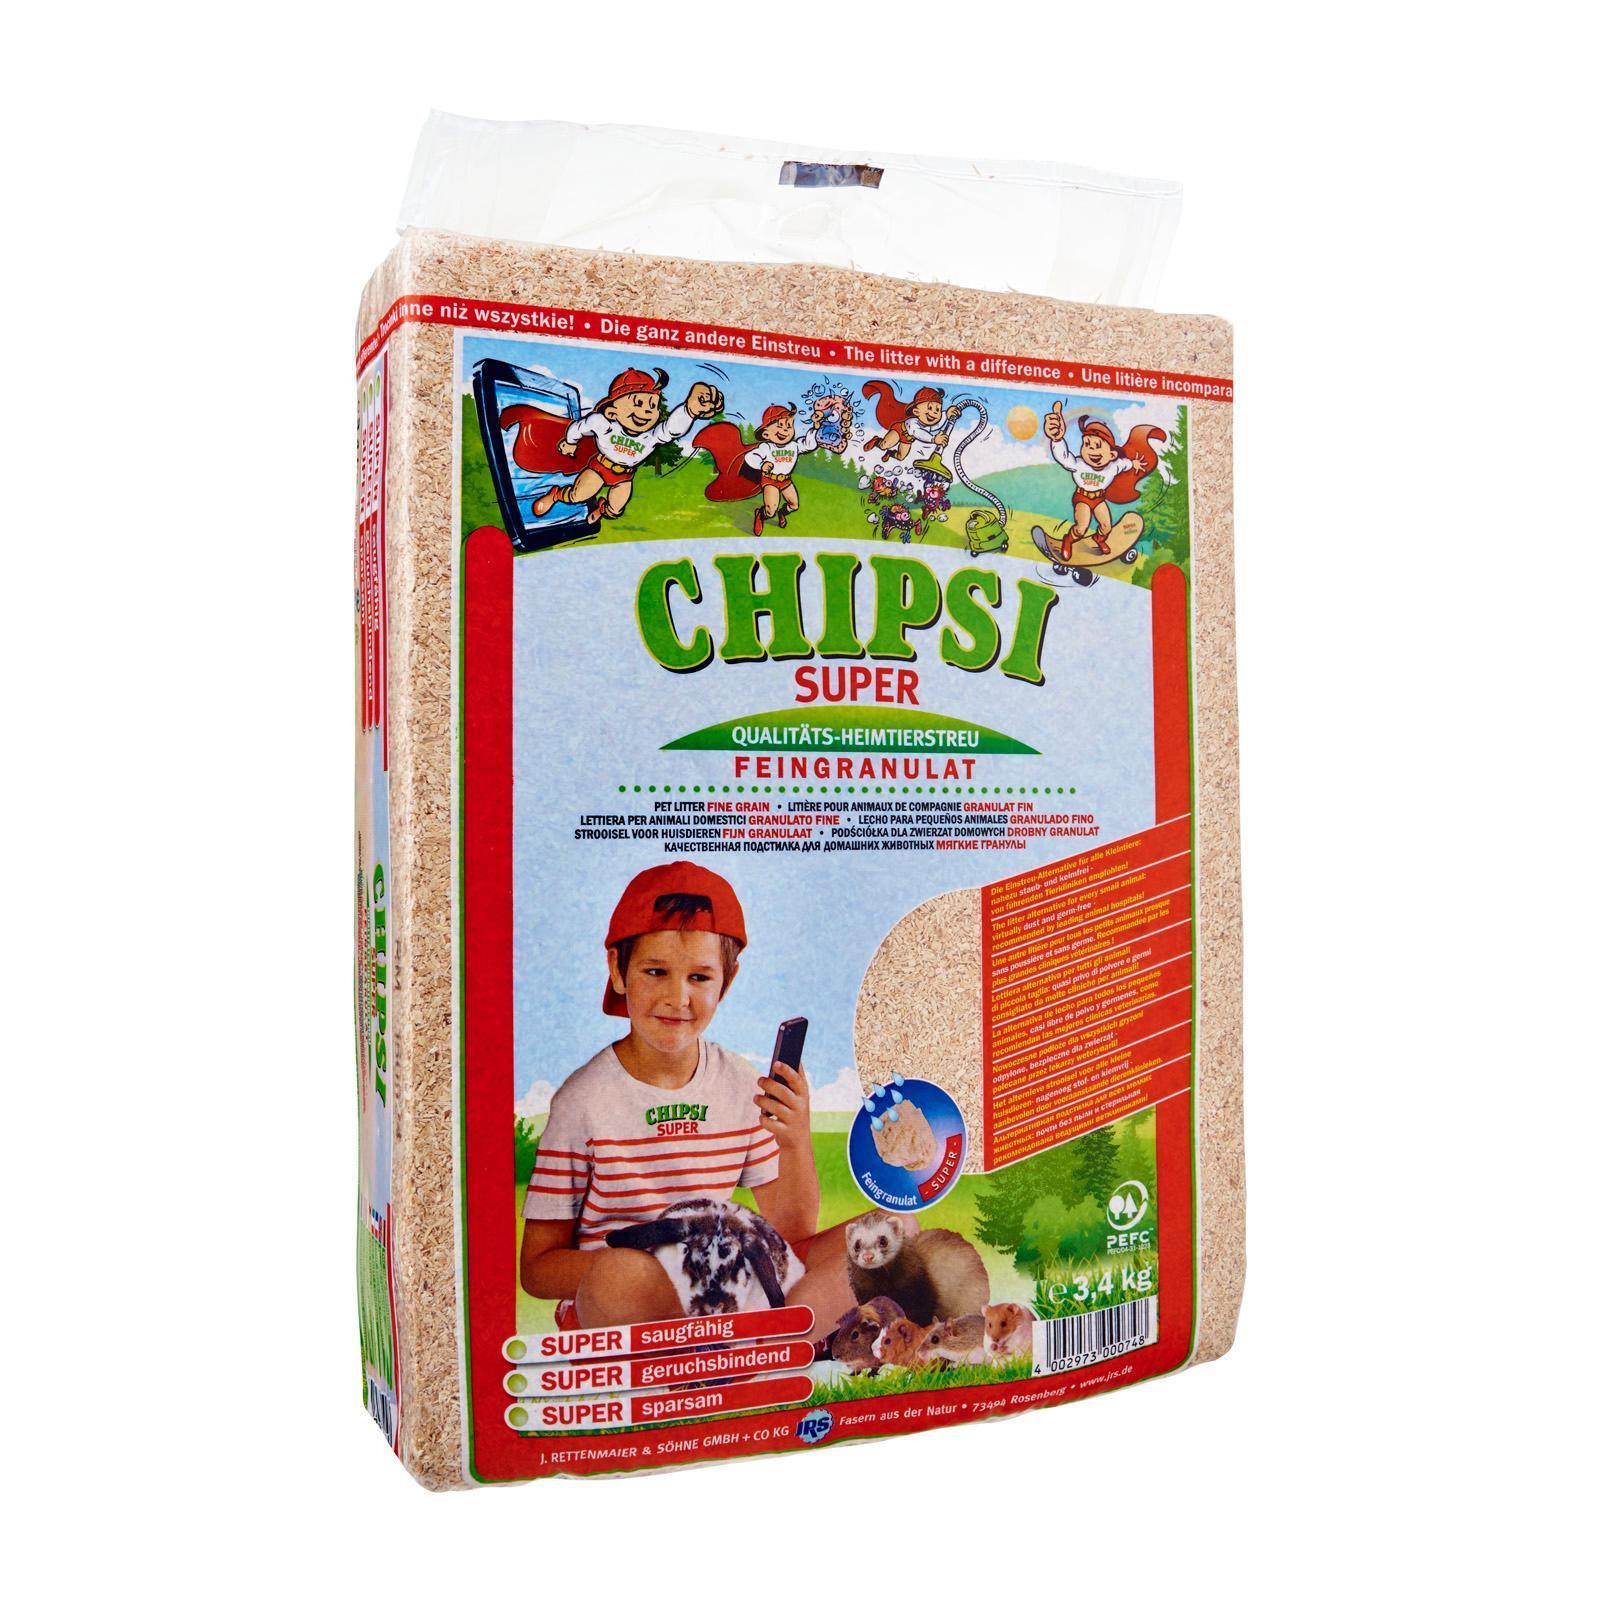 Chipsi Super Pet Litter 3.4Kg